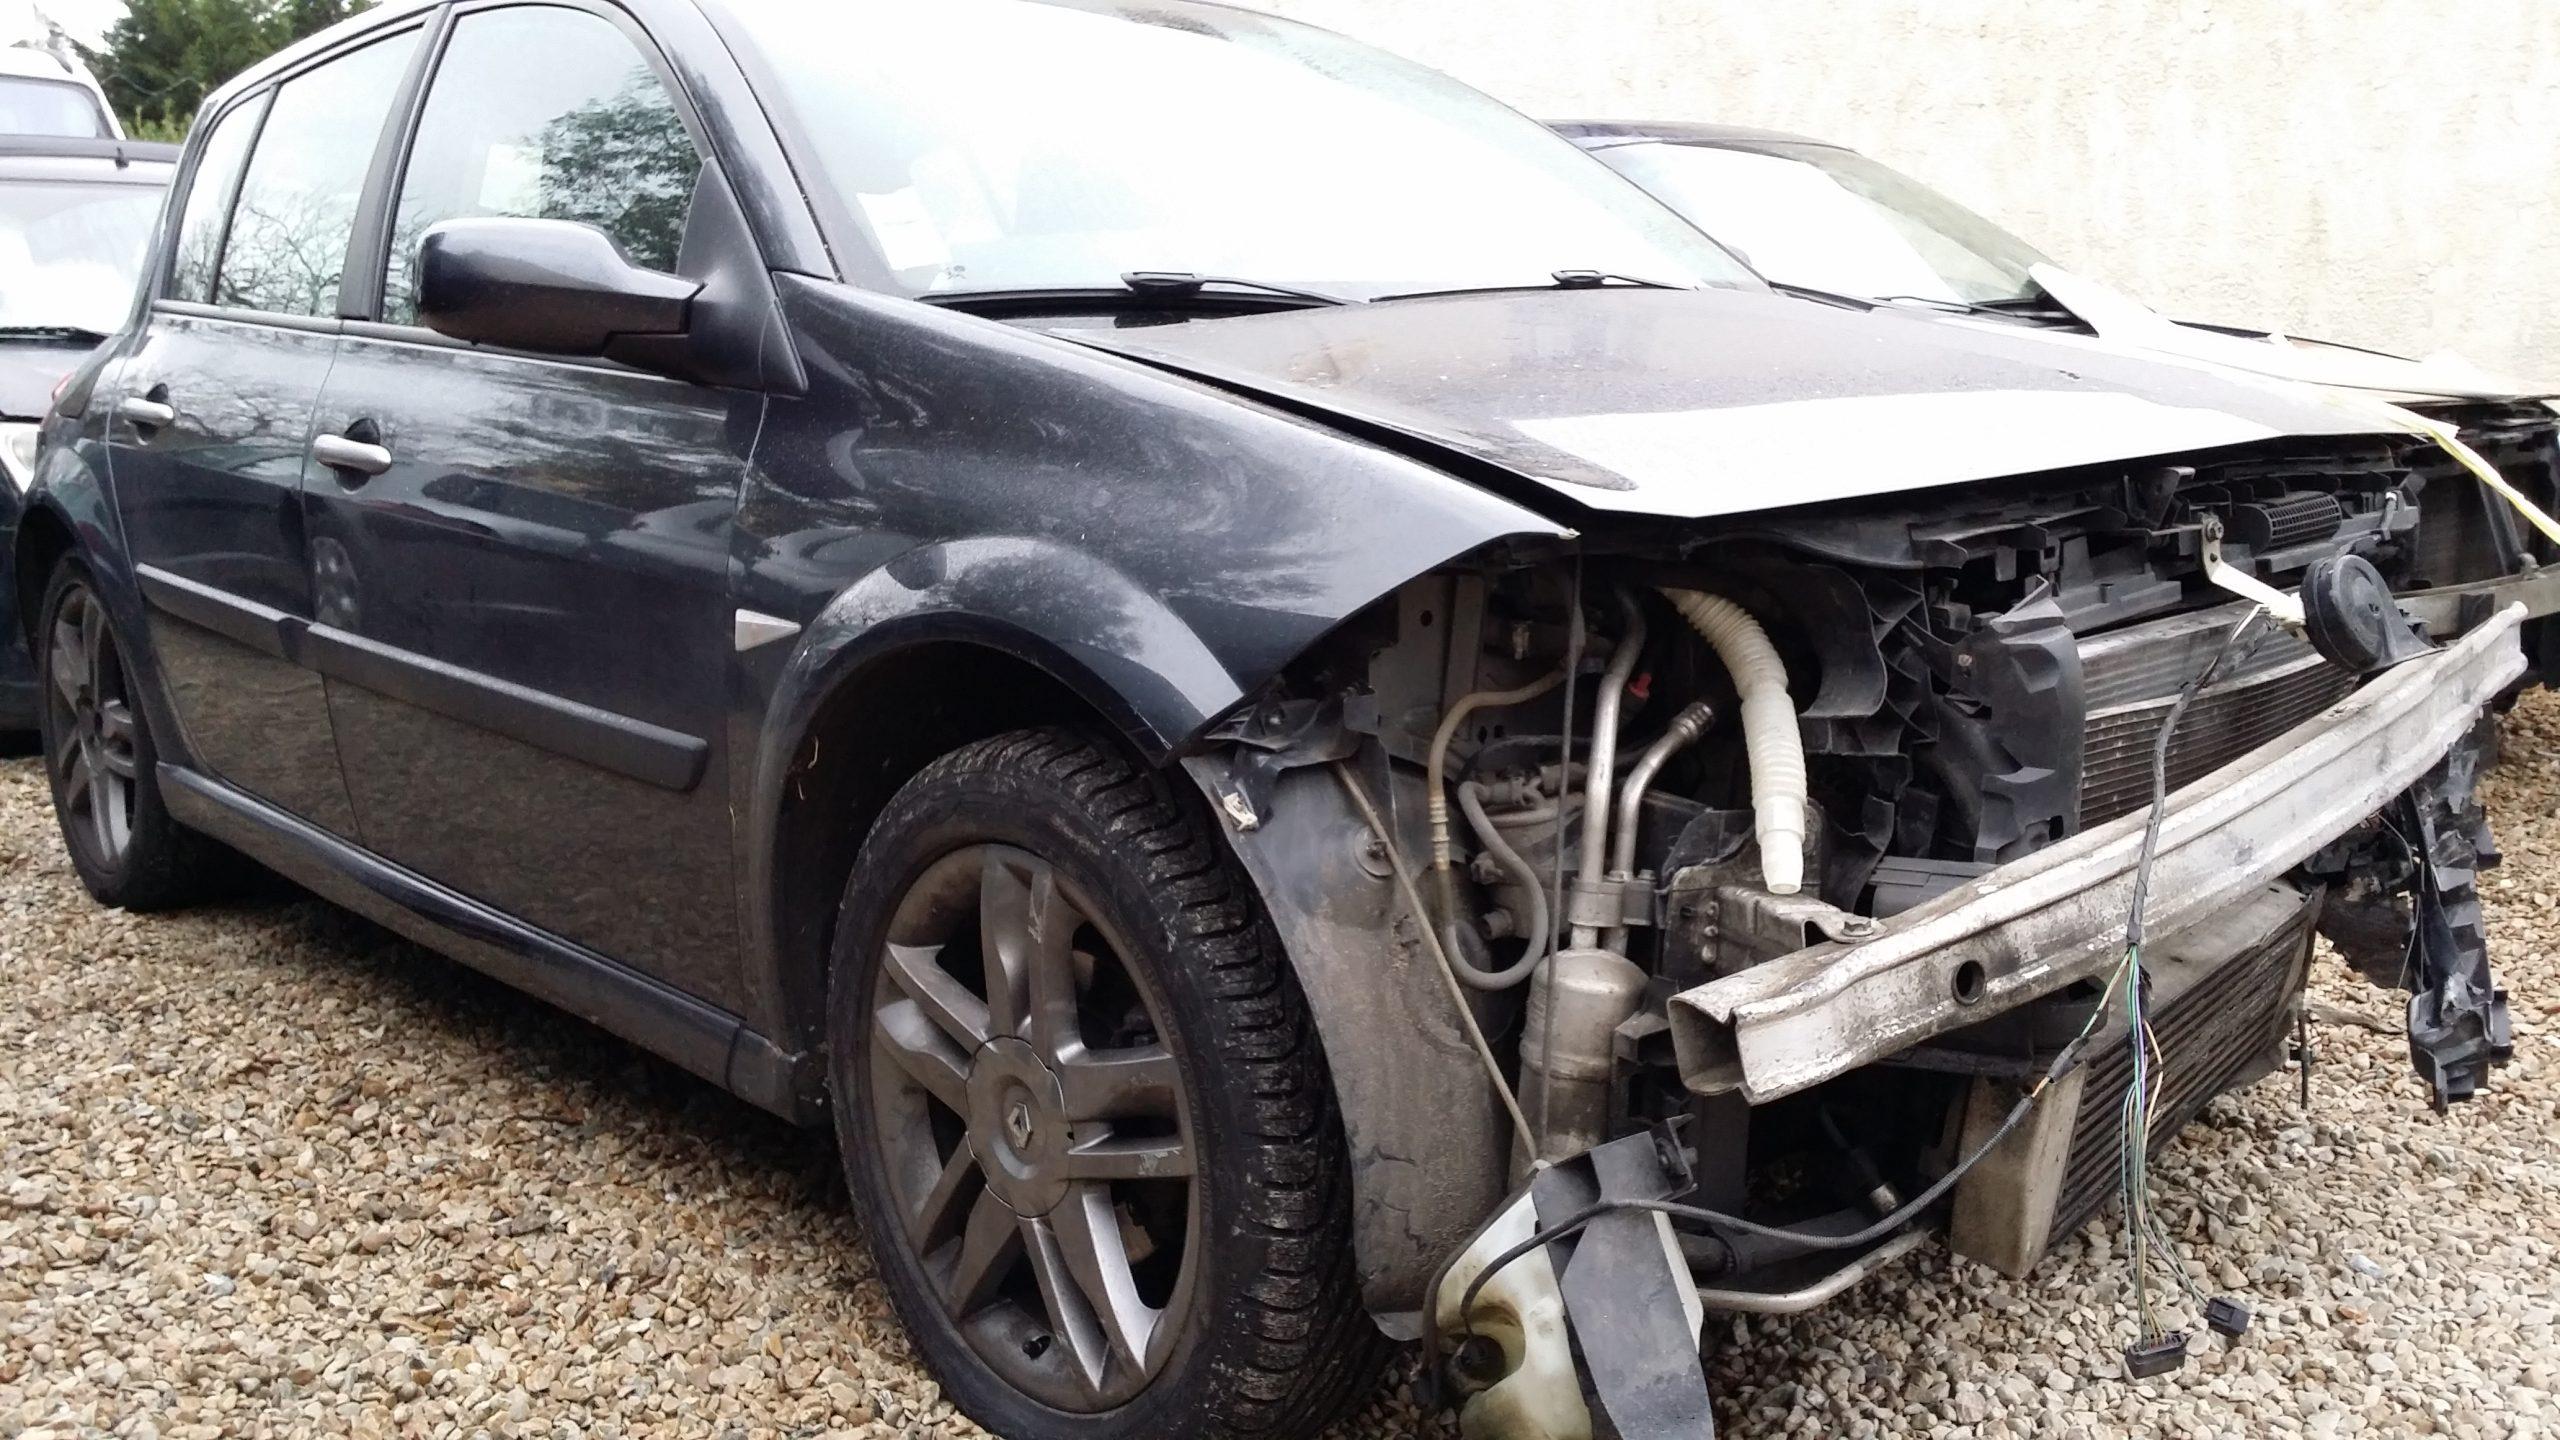 Rachat voiture epave hs panne accidentee gagee Sucy-en-Brie